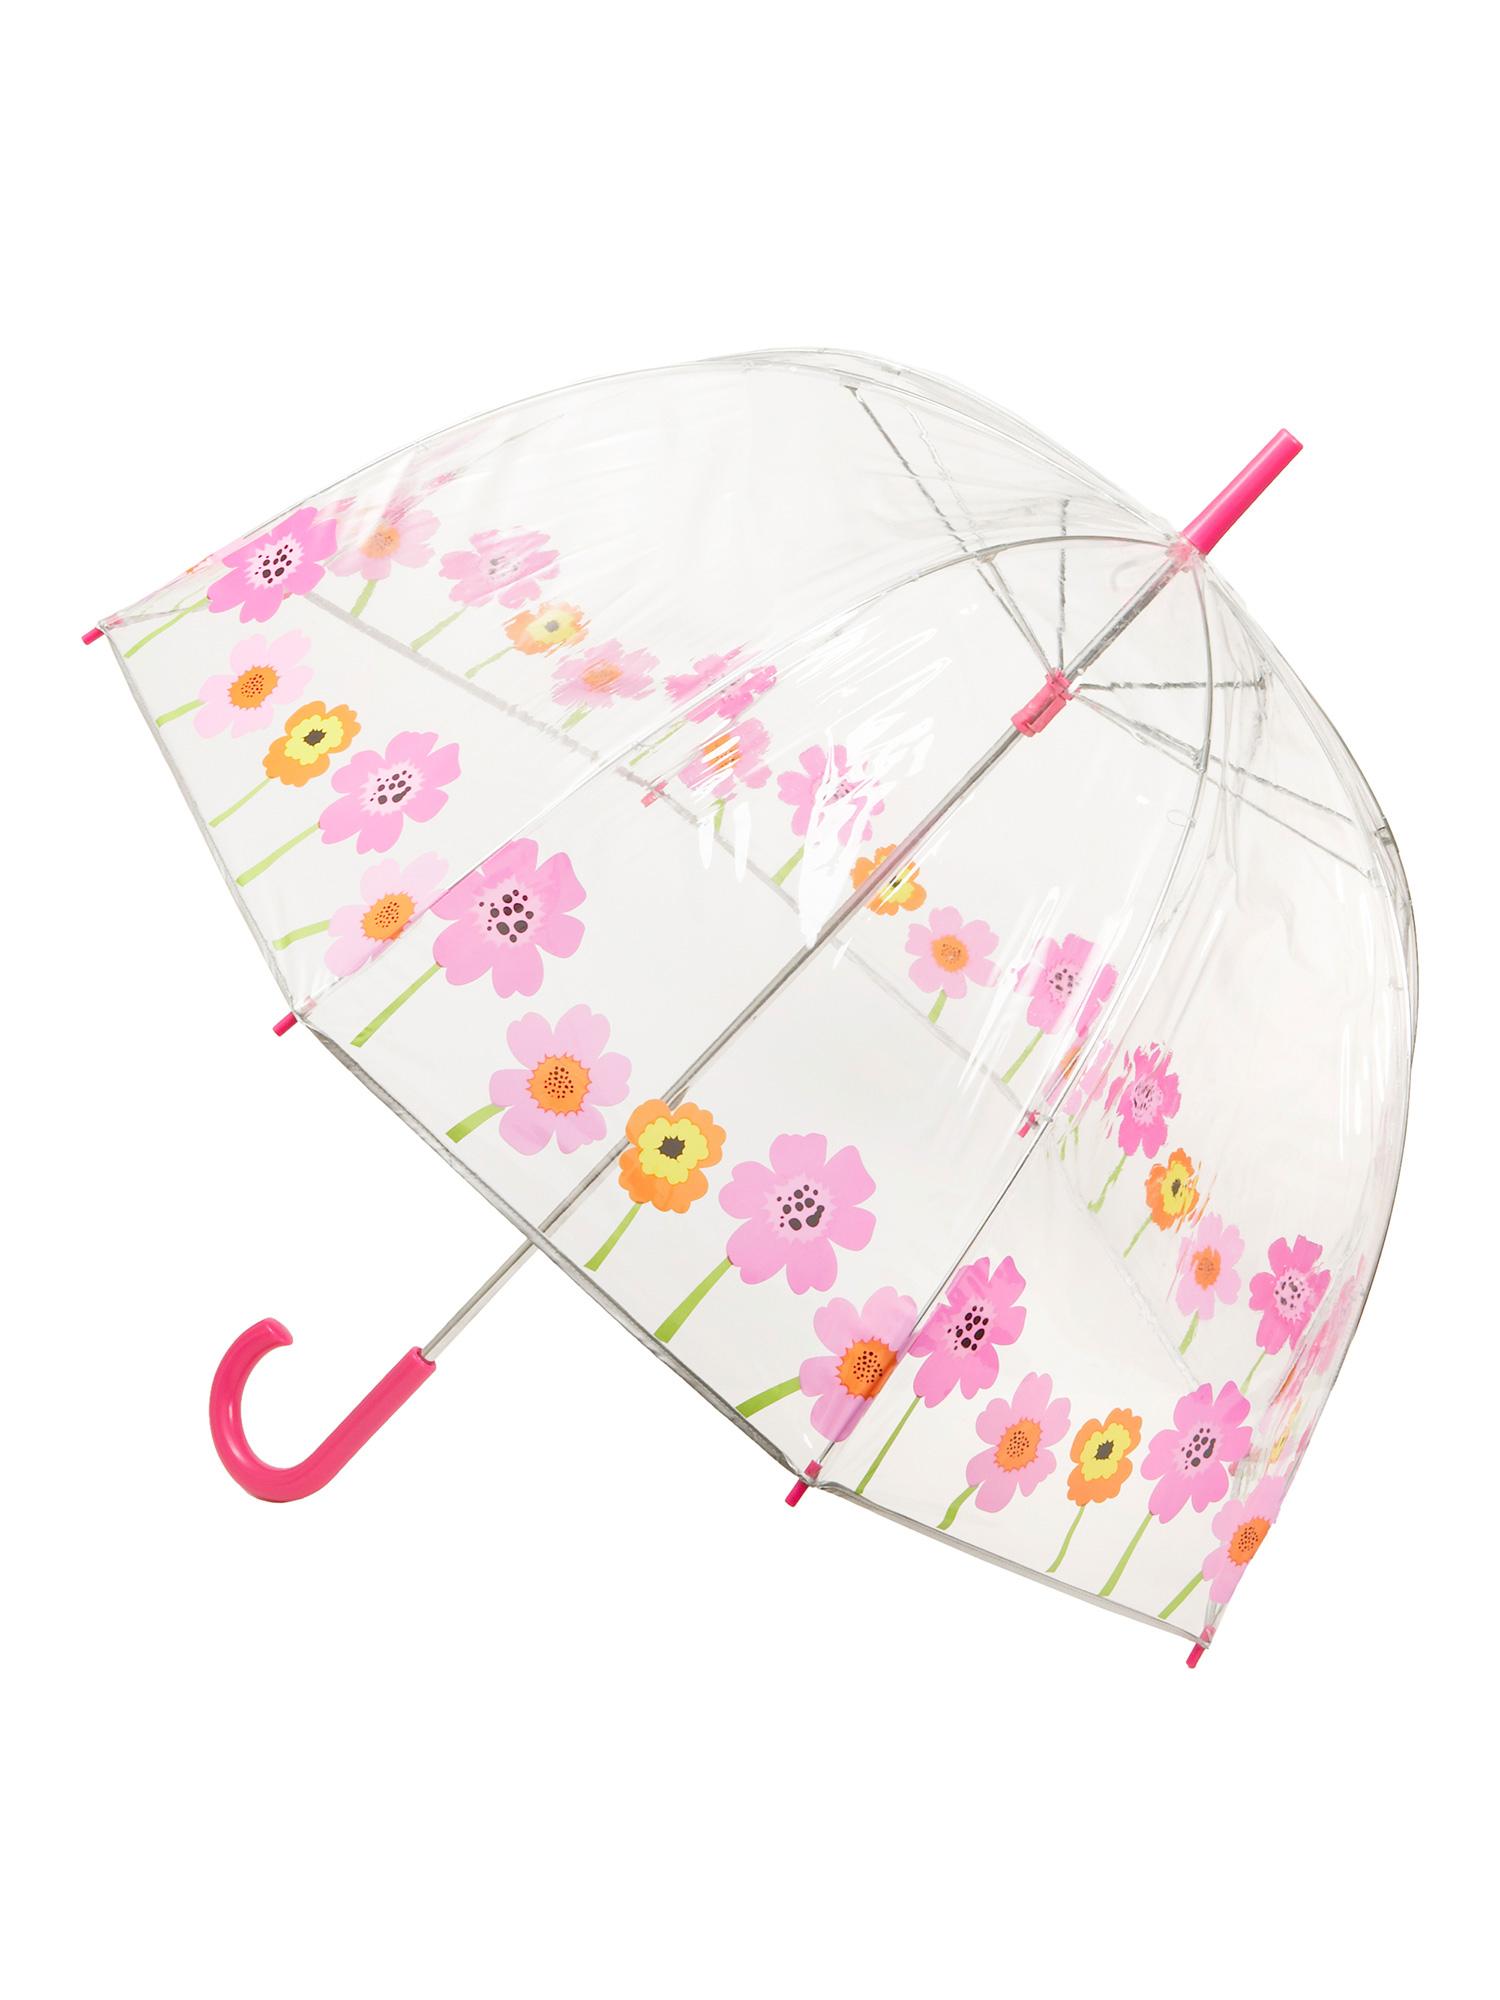 Totes Classic Canopy Clear Bubble Umbrella